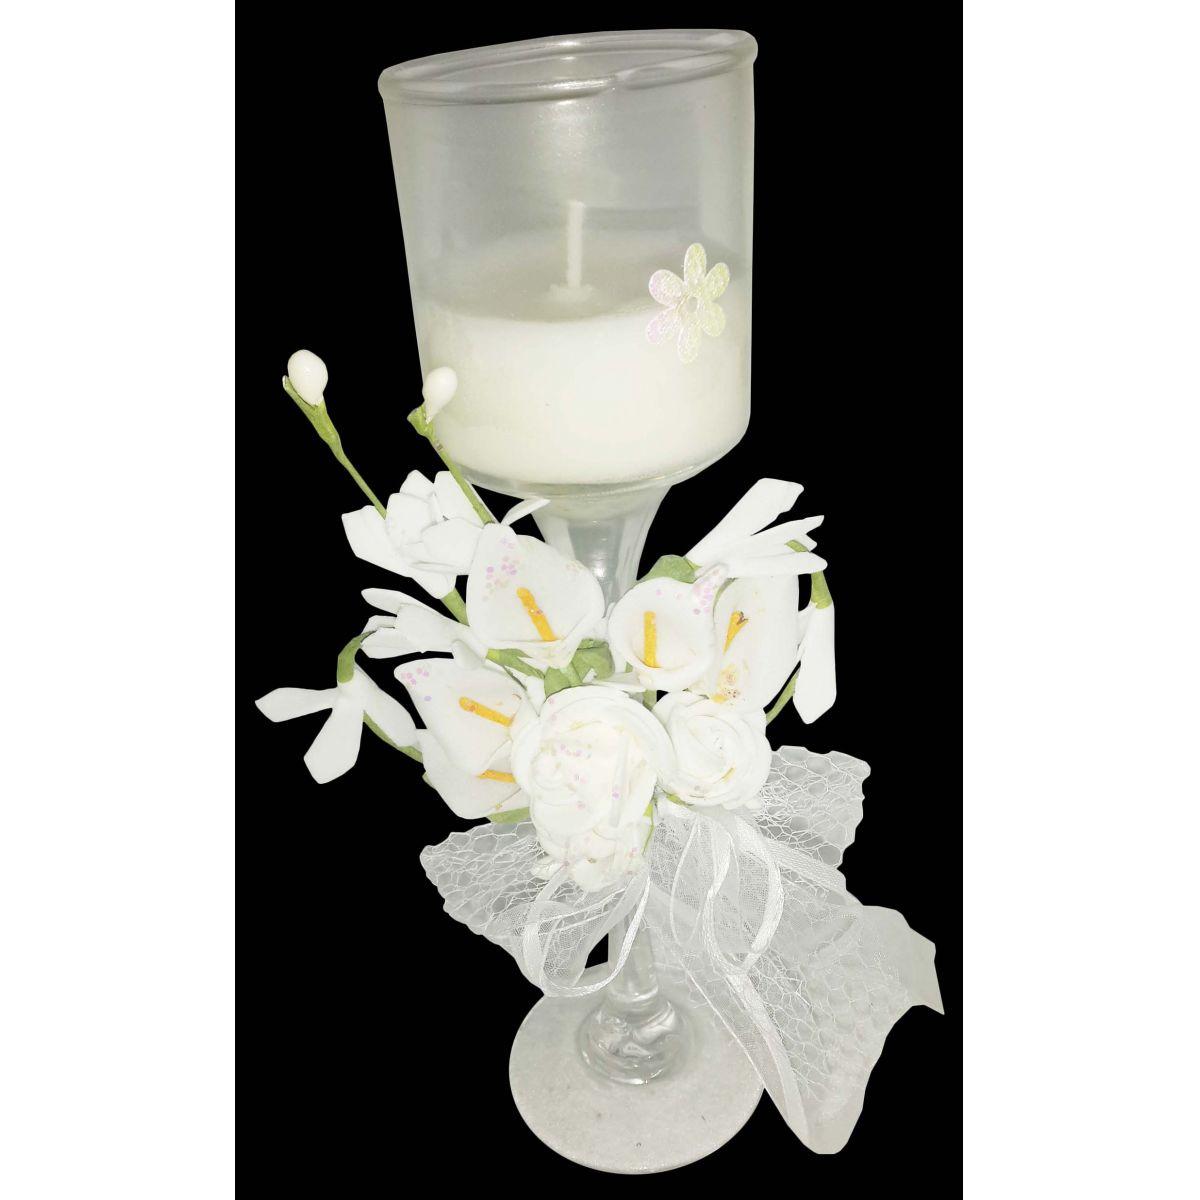 Vela Parafina Aromatizante Decorativa Media Fragrancia Flores Branca (WL-B)